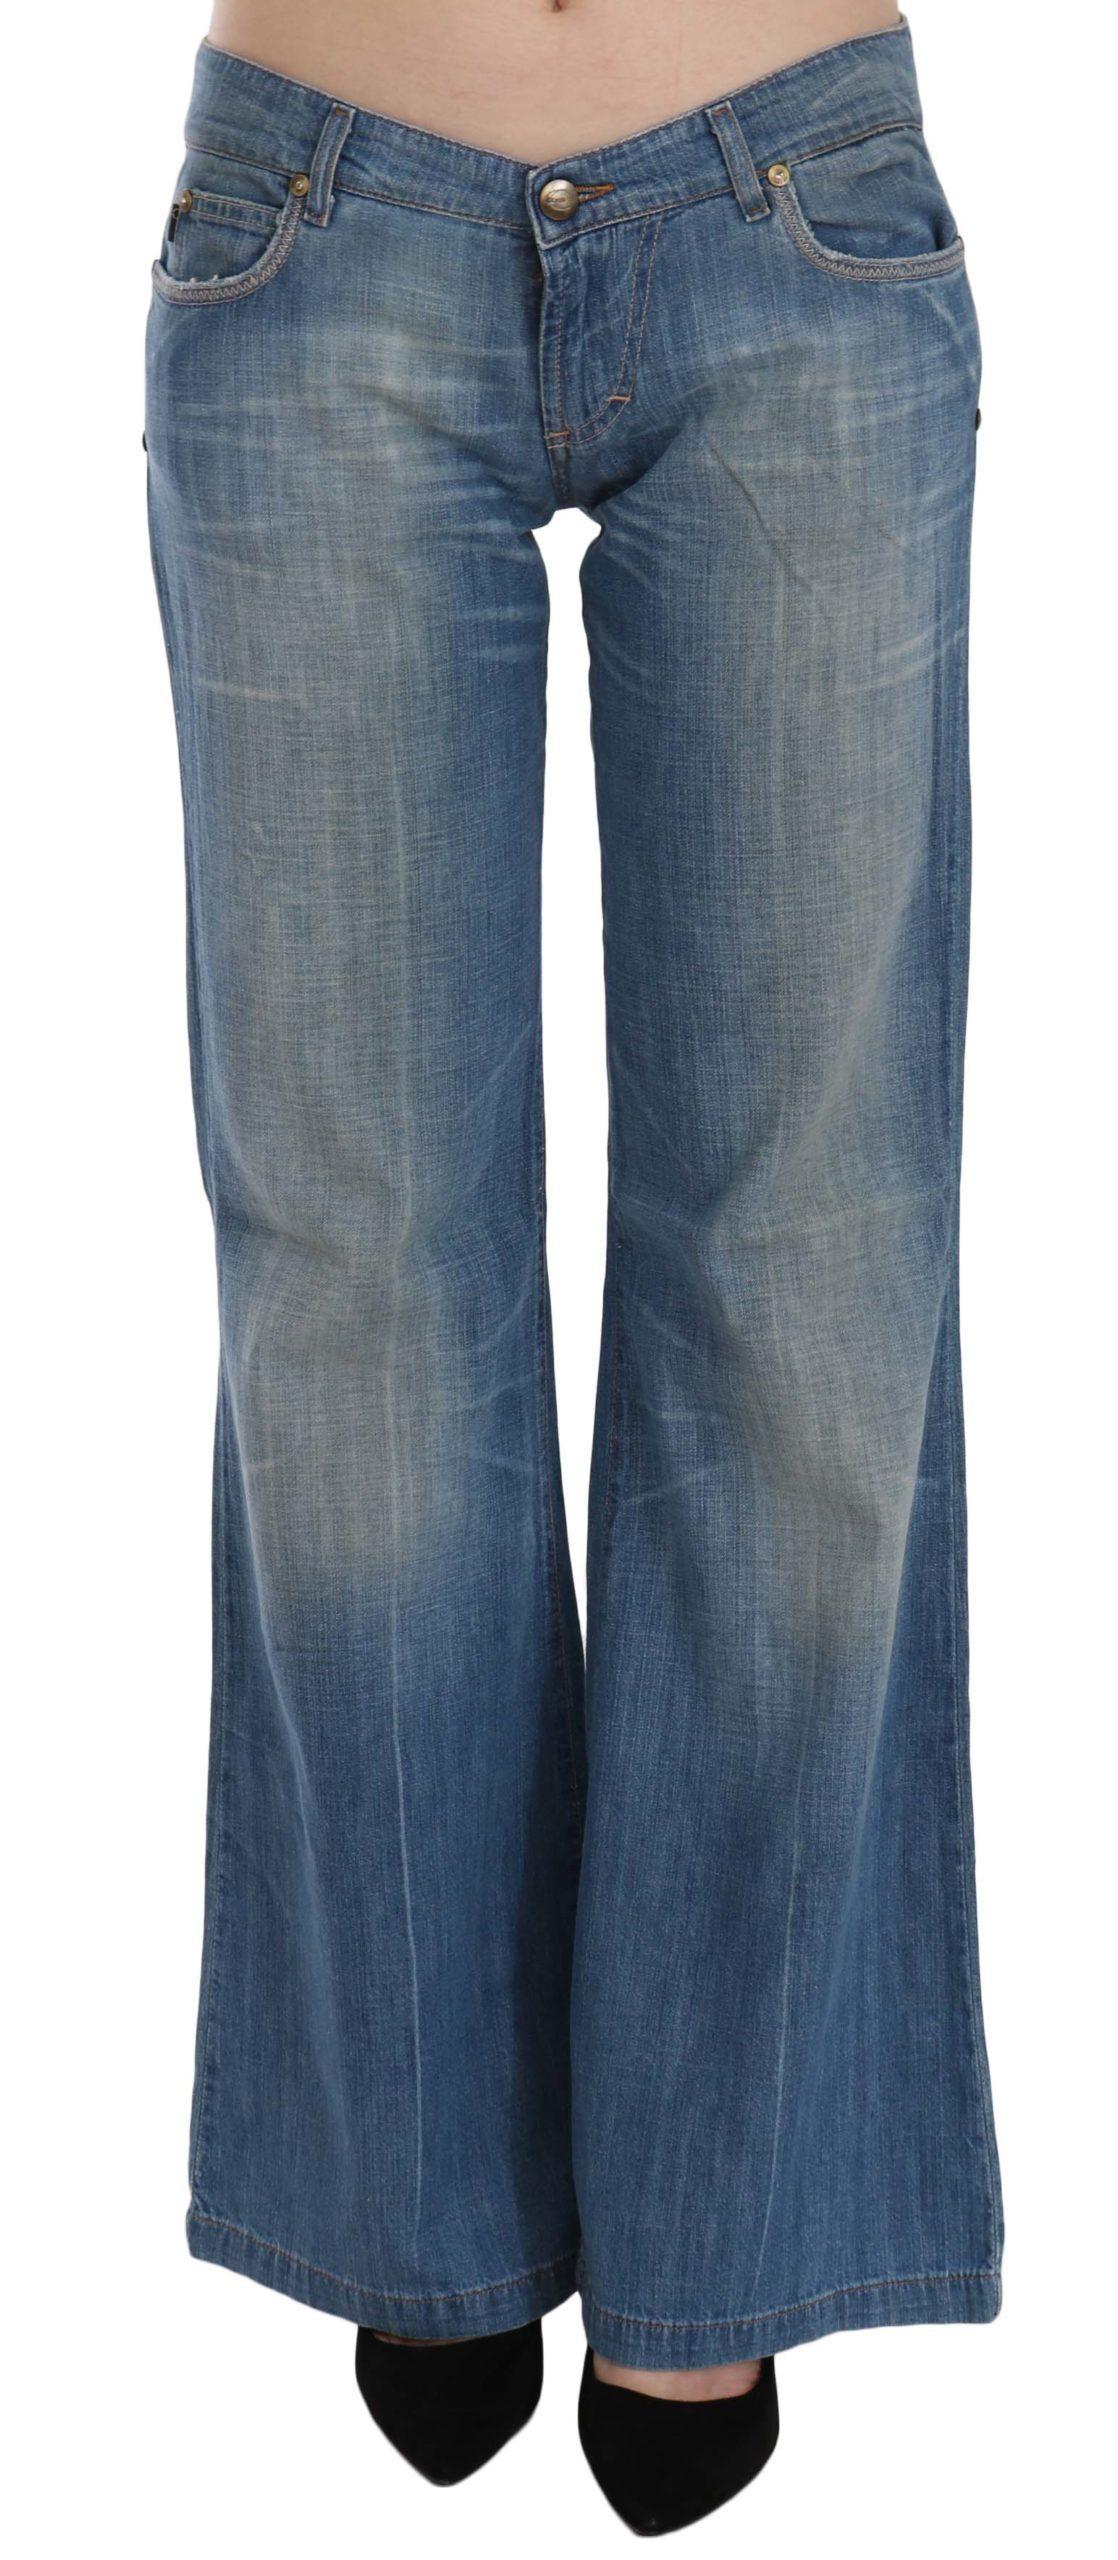 Just Cavalli Women's Low Waist Flared Denim Trouser Blue PAN70347 - W29